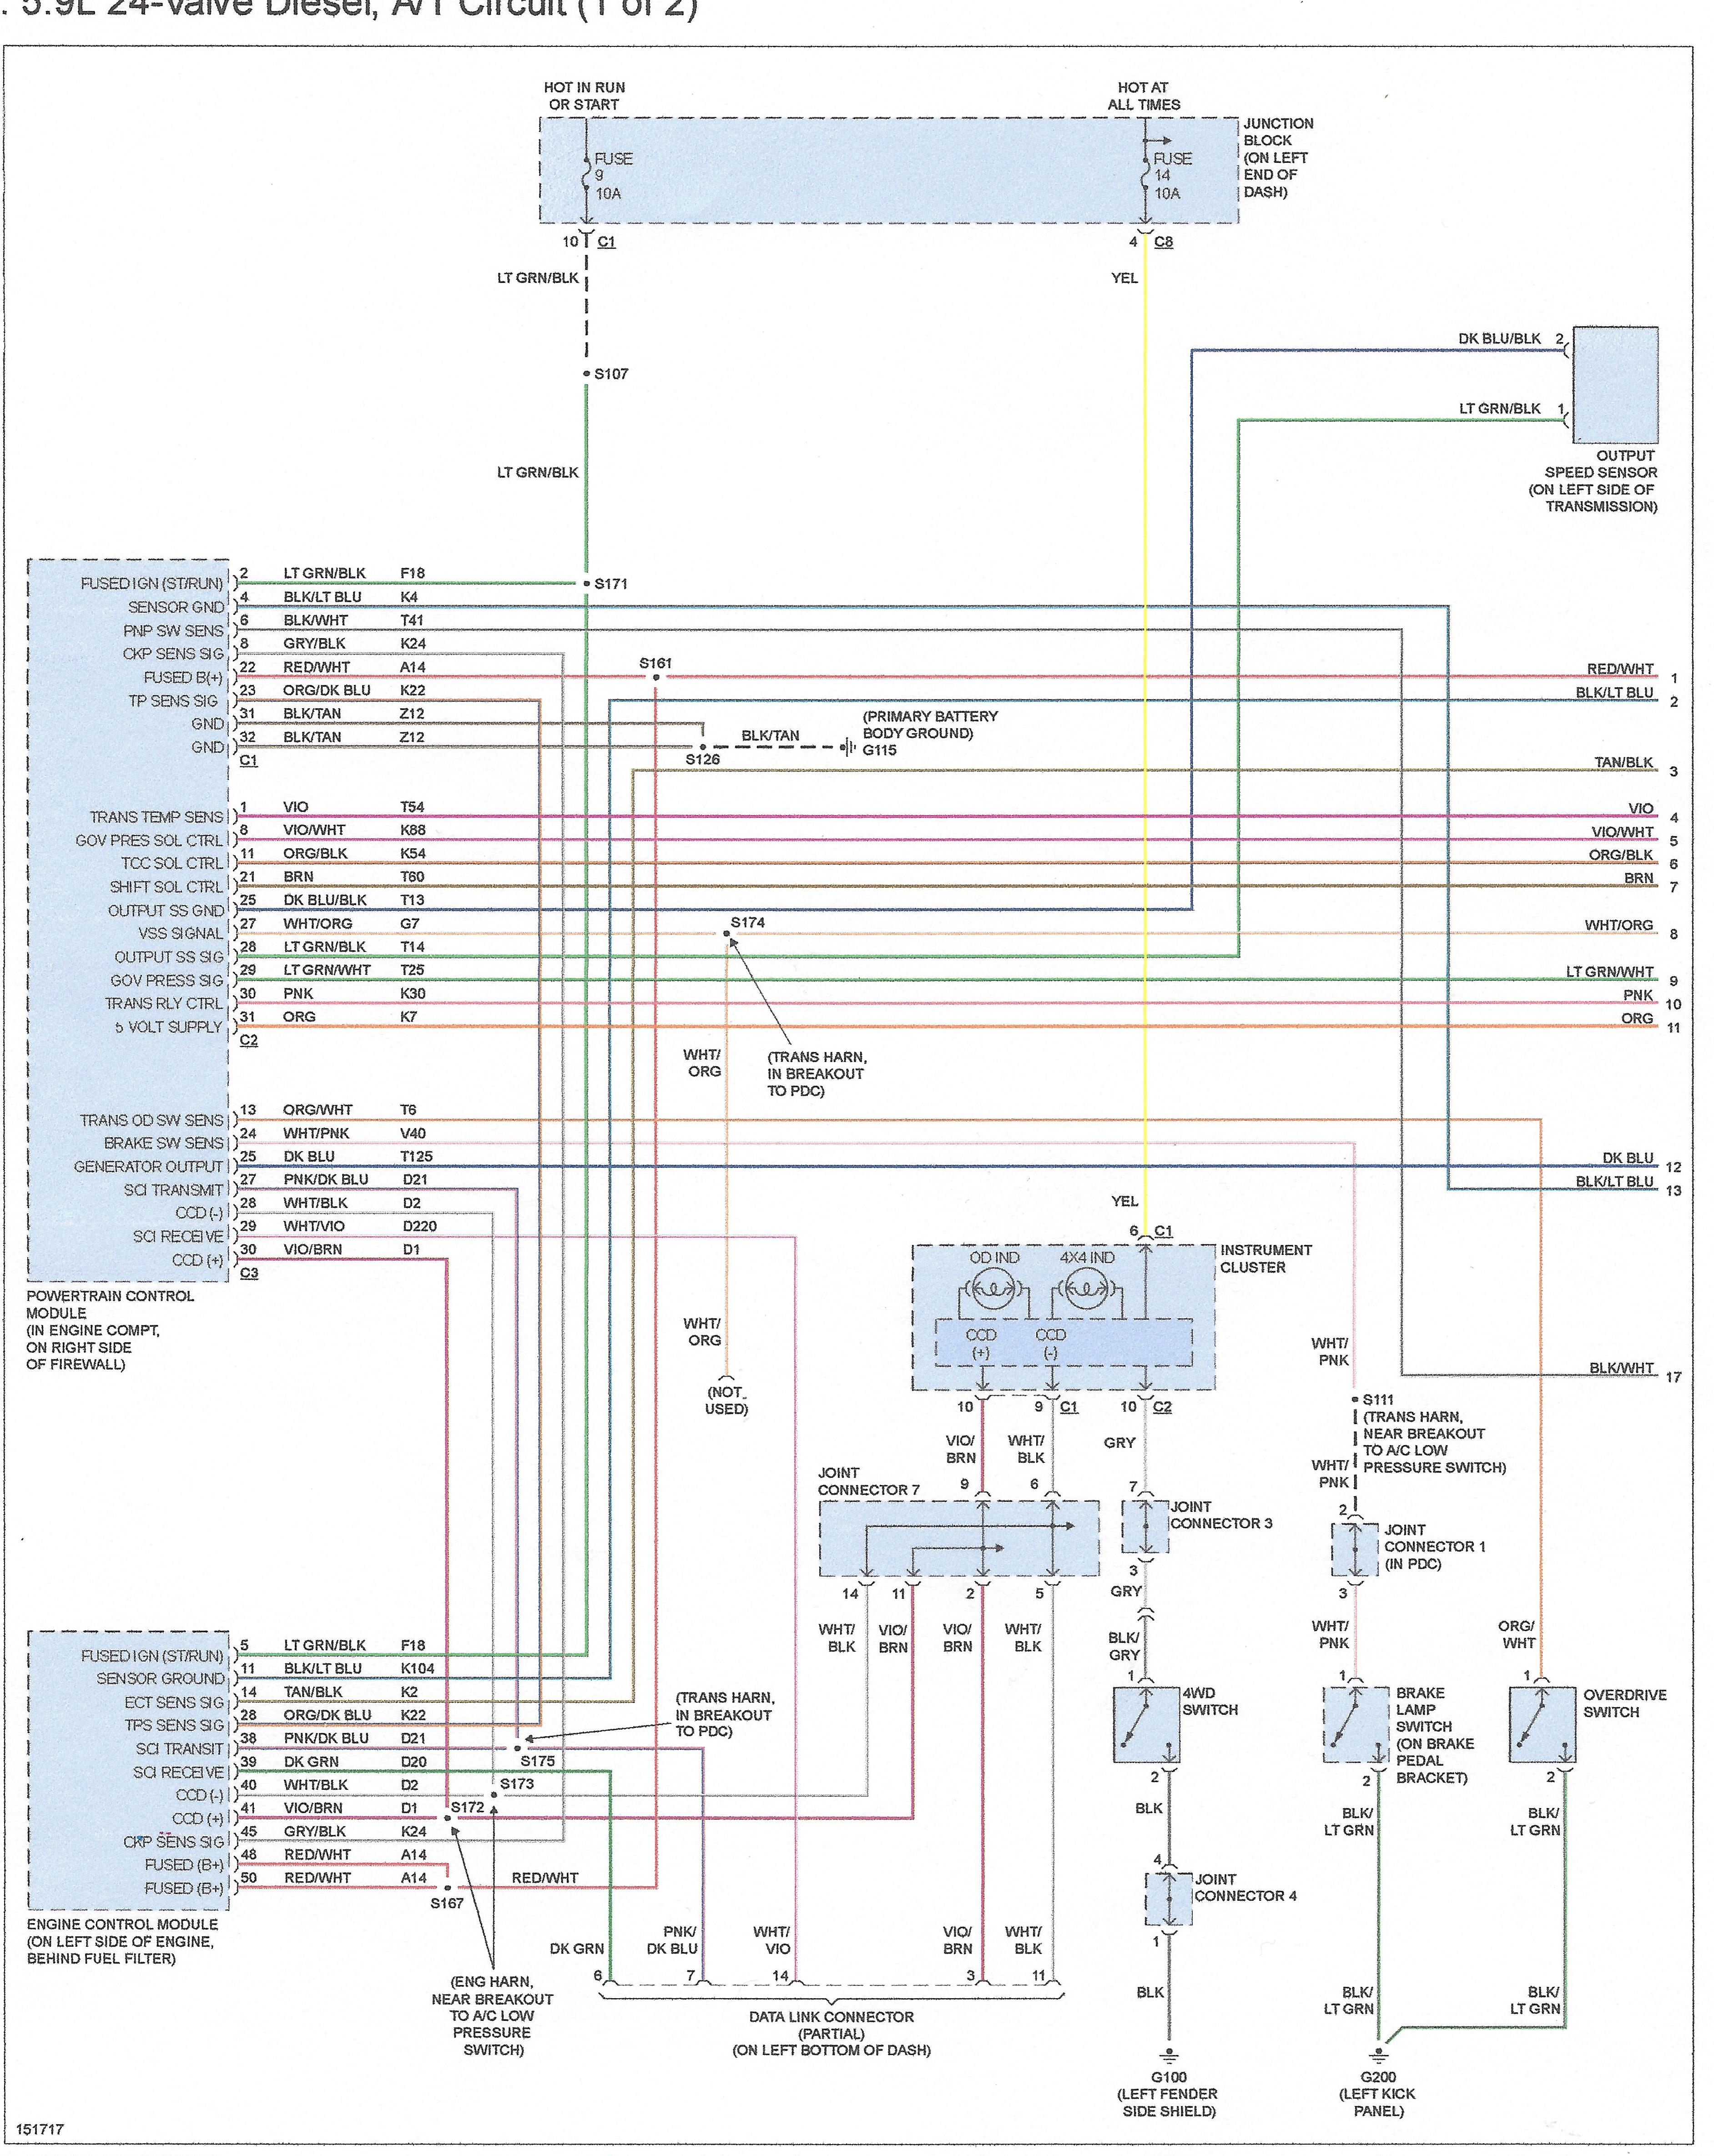 Dodge Ram Tcc Wiring Diagram Diagrams 2012 Ac Solving Diesel Lockup Issues By Eliminating Connectors Rh Certifiedtransmission Wordpress Com Light